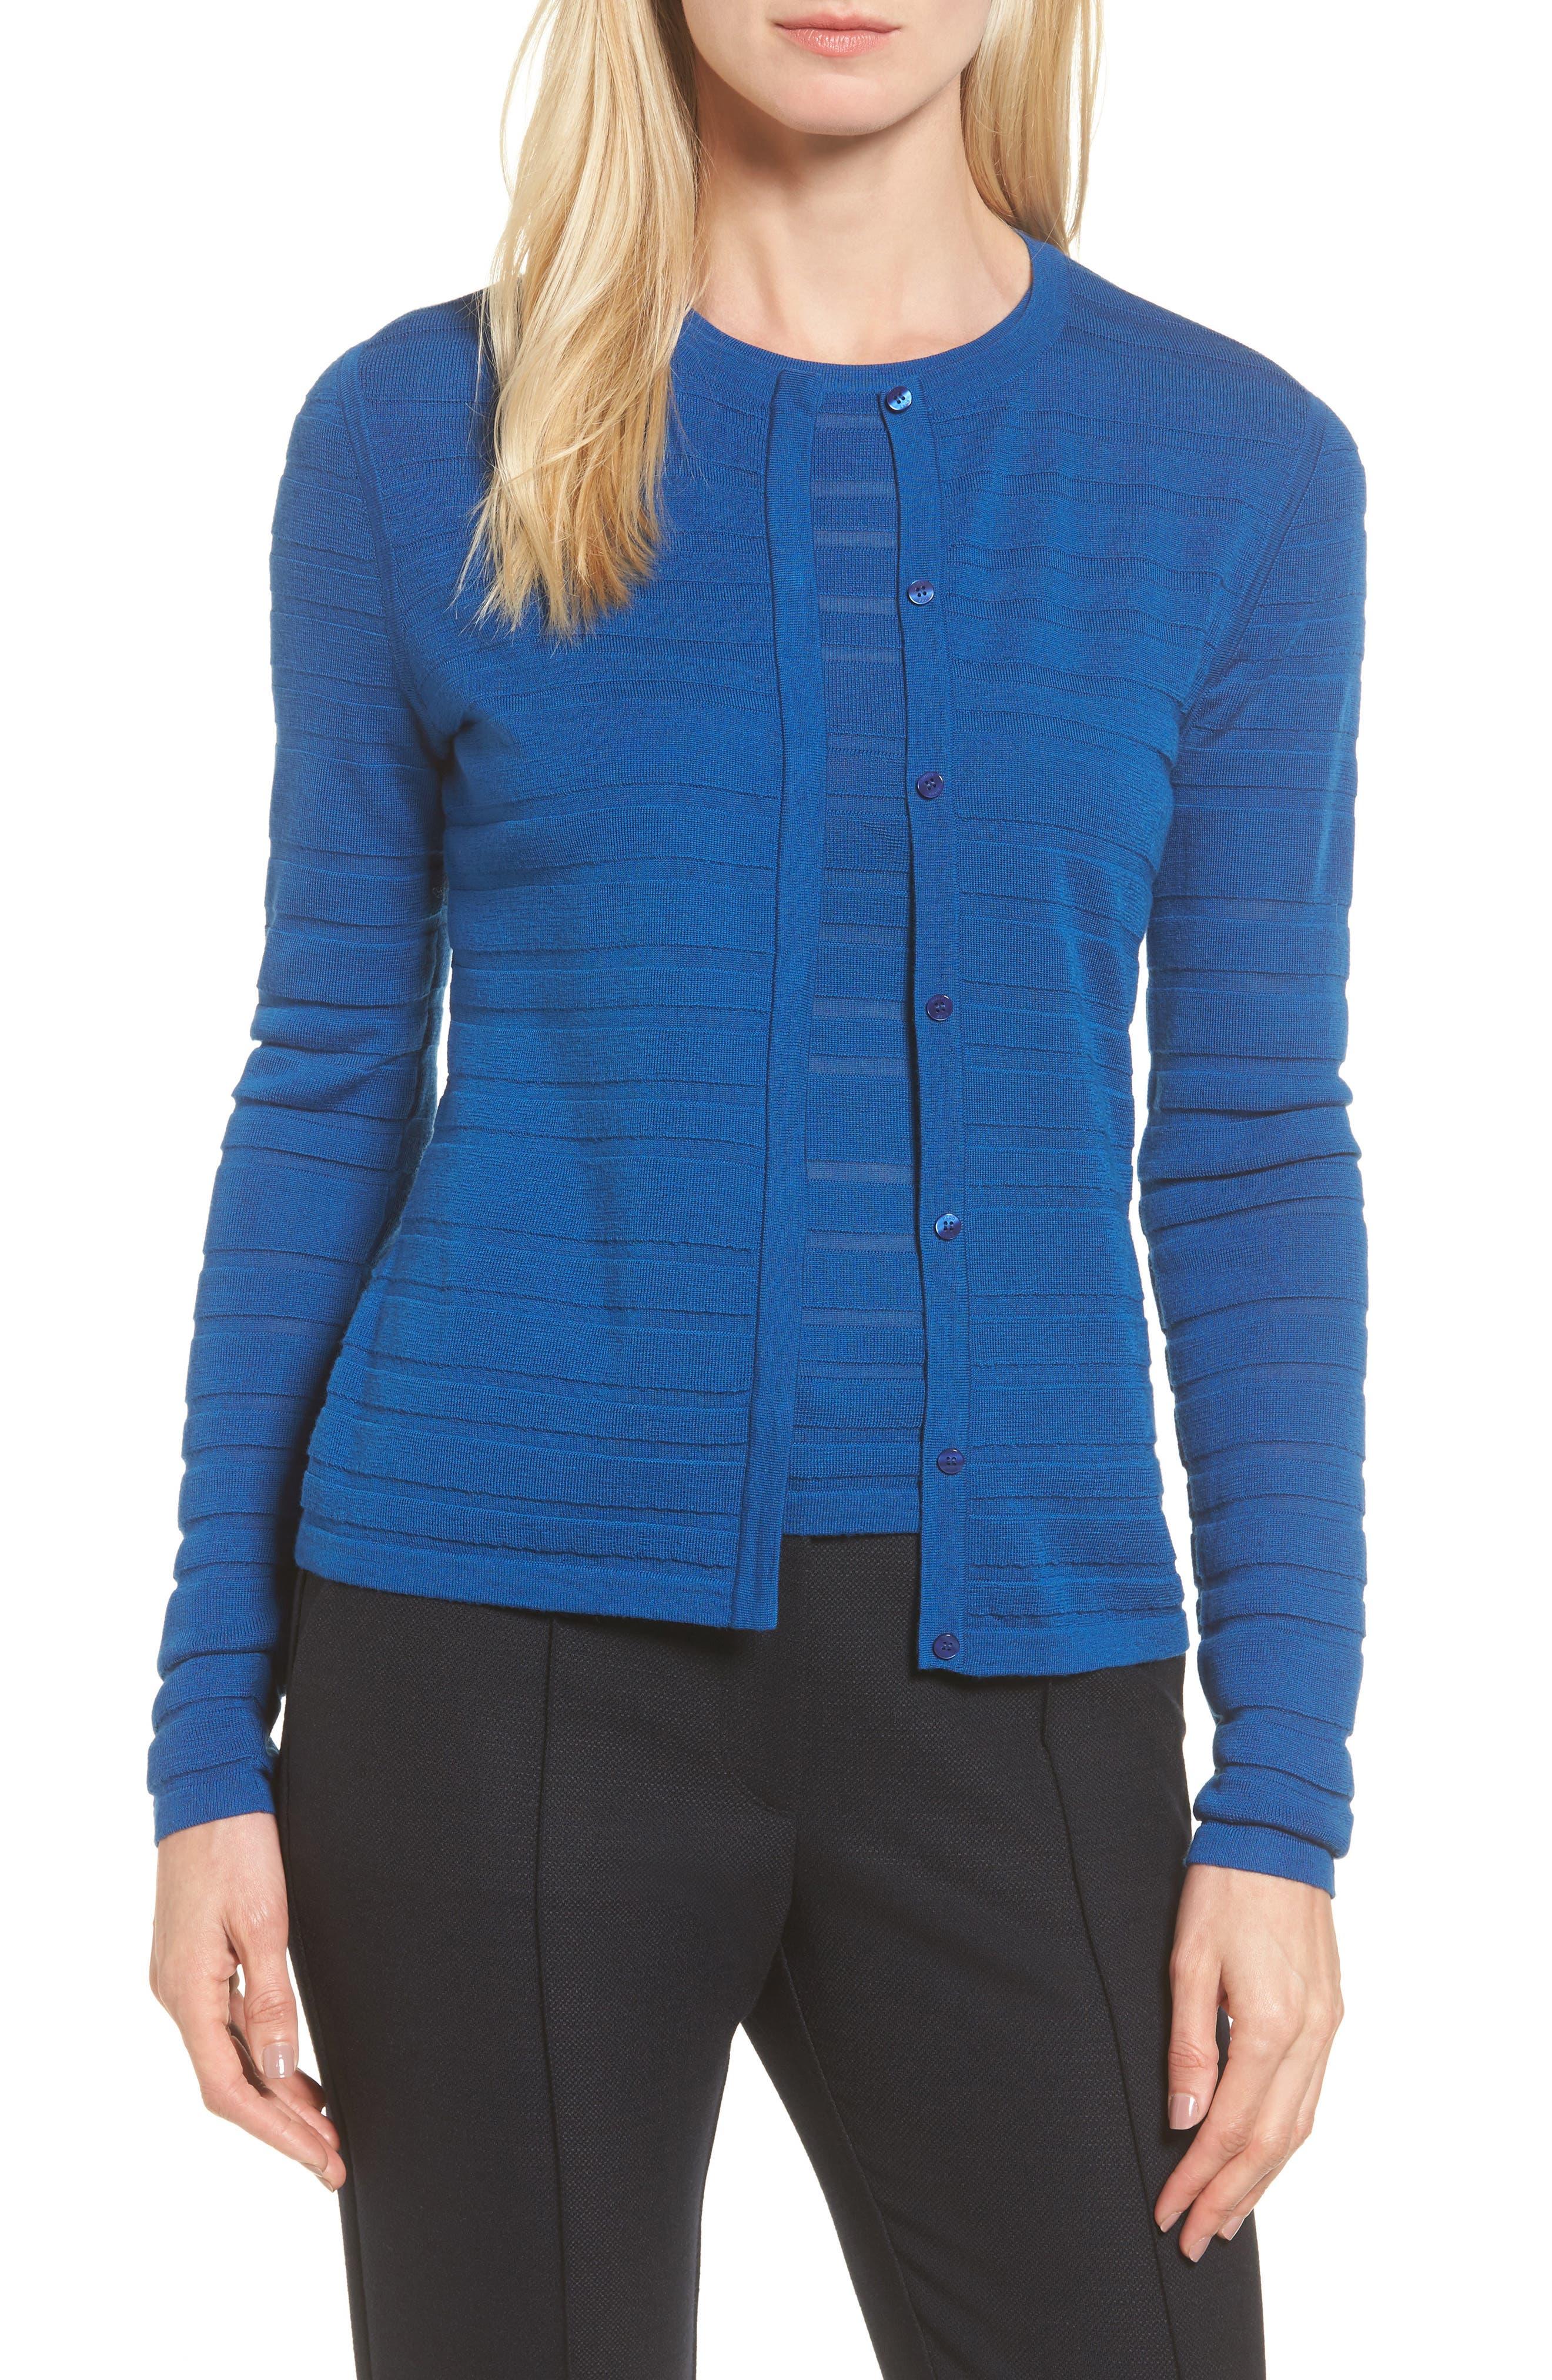 Main Image - BOSS Fahsa Stripe Textured Wool Cardigan